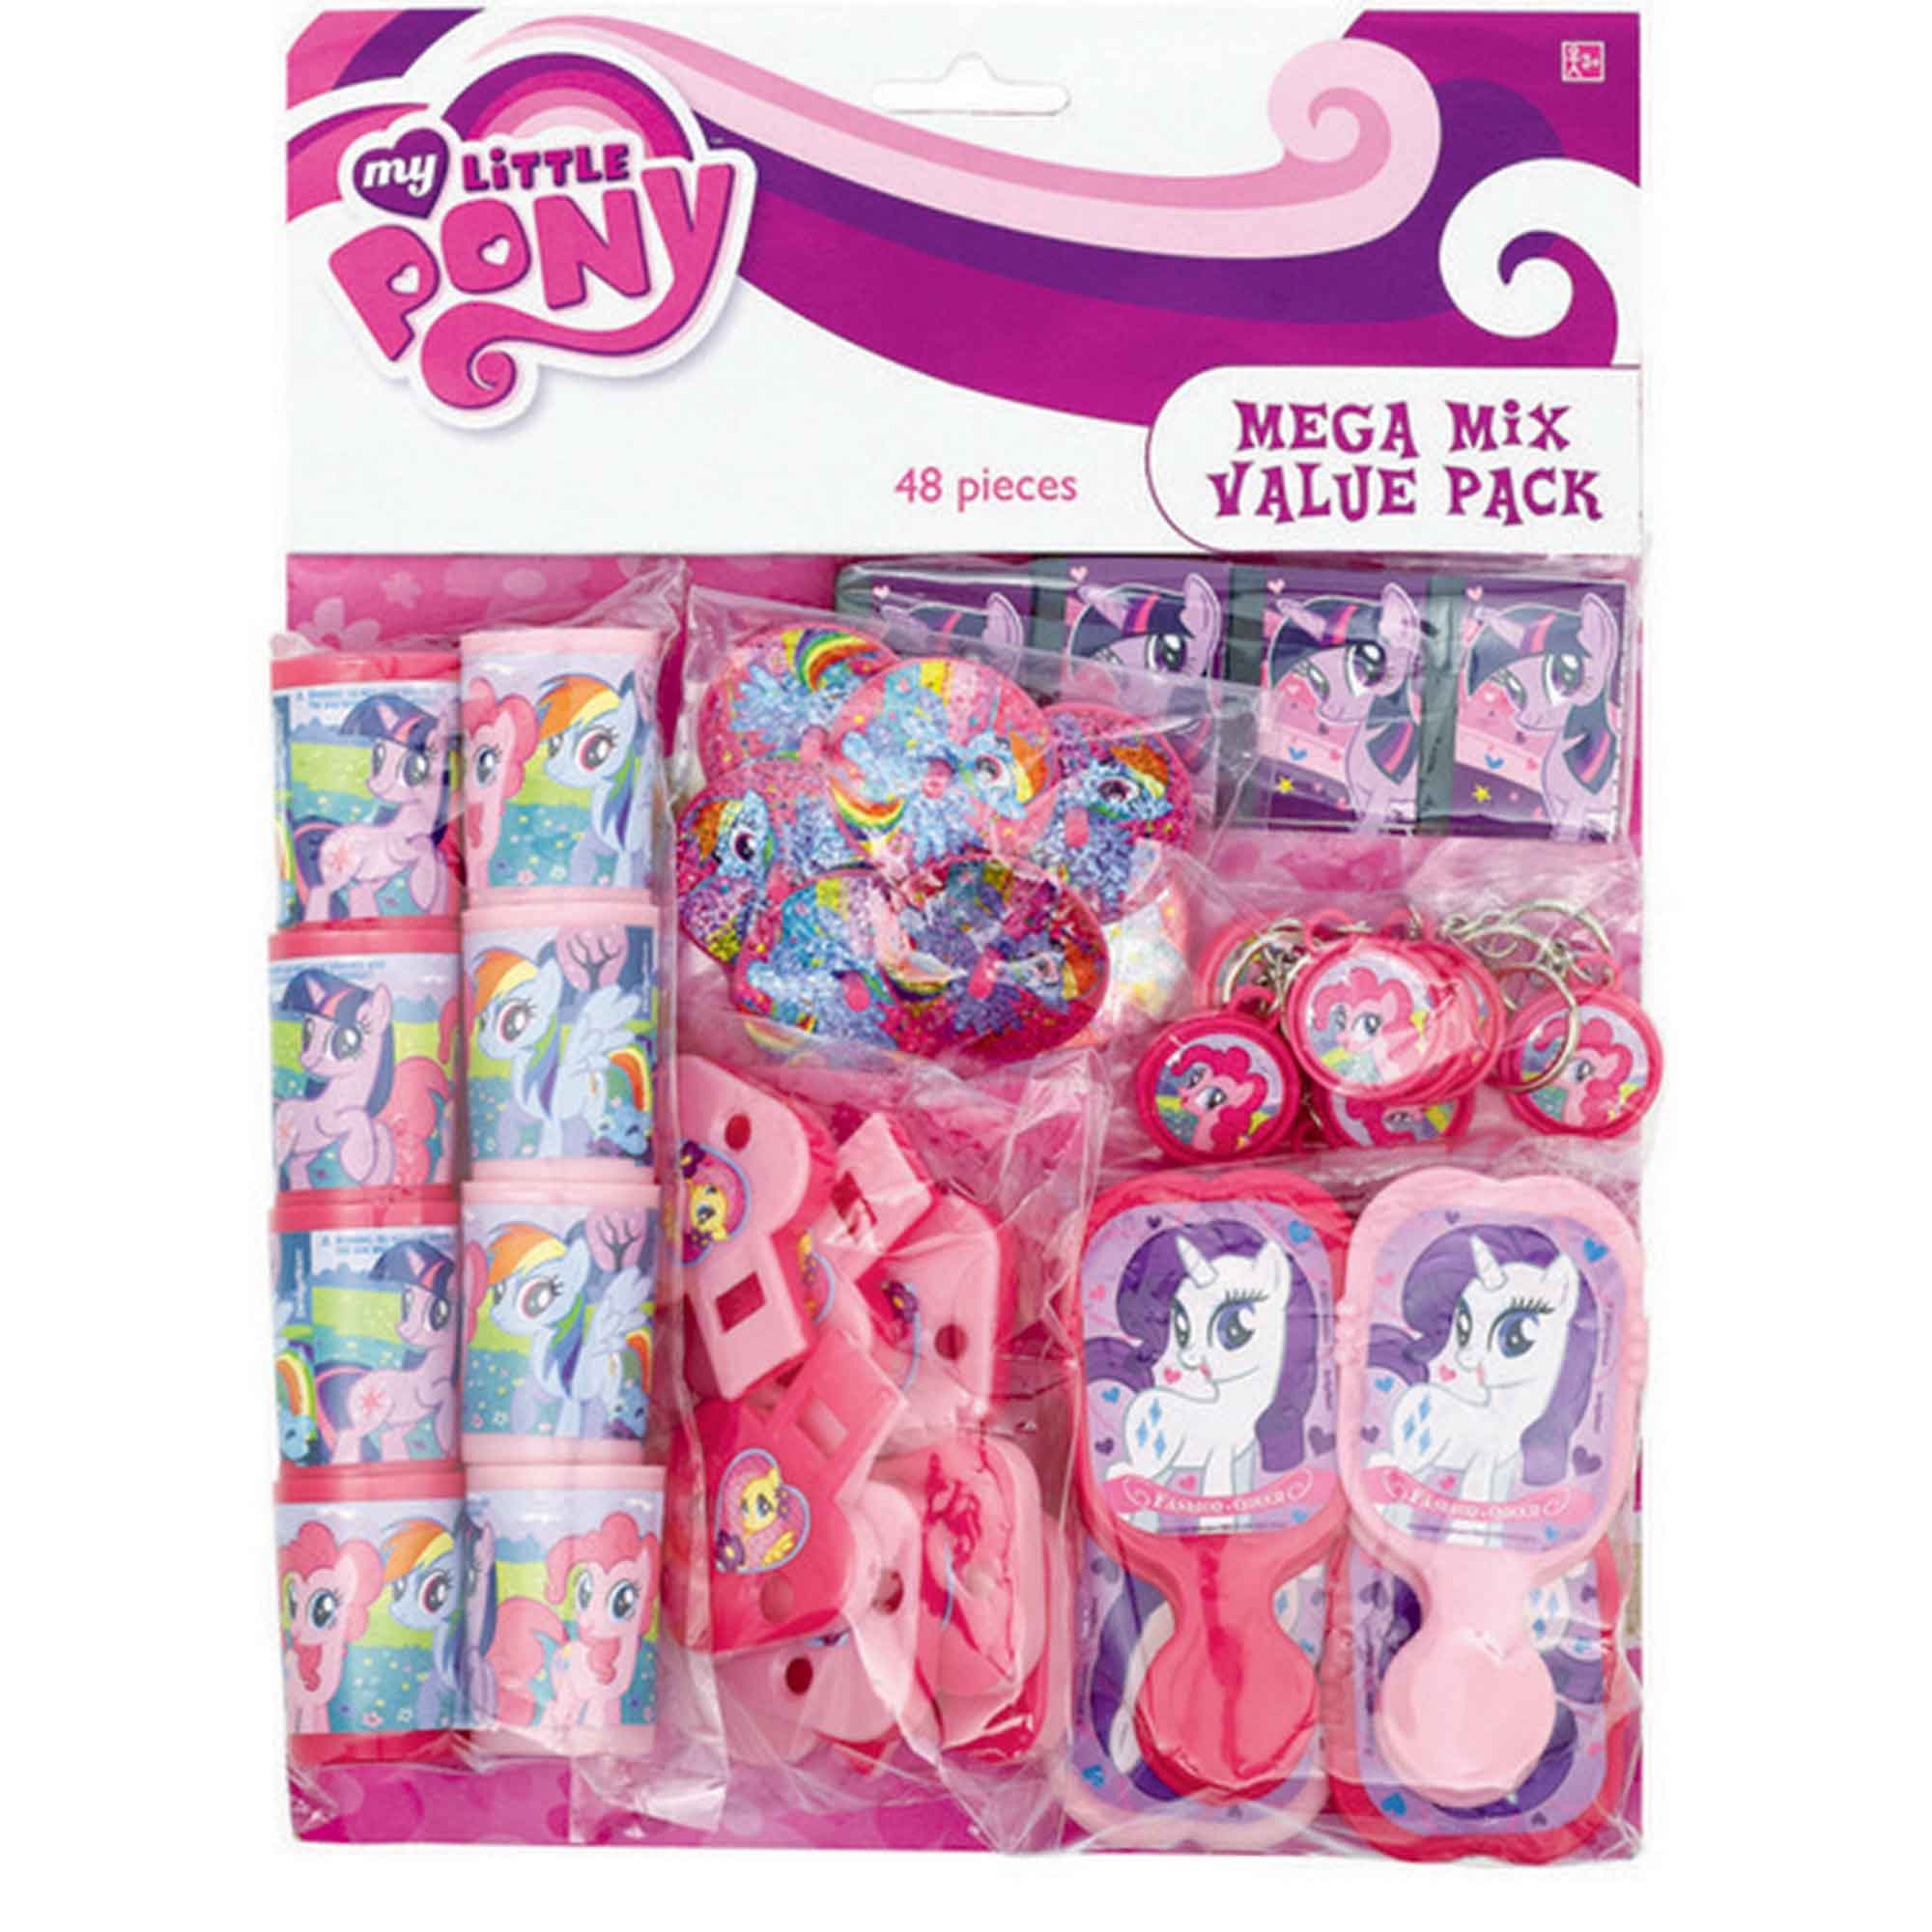 My Little Pony Friendship Mega Mix Value Pack